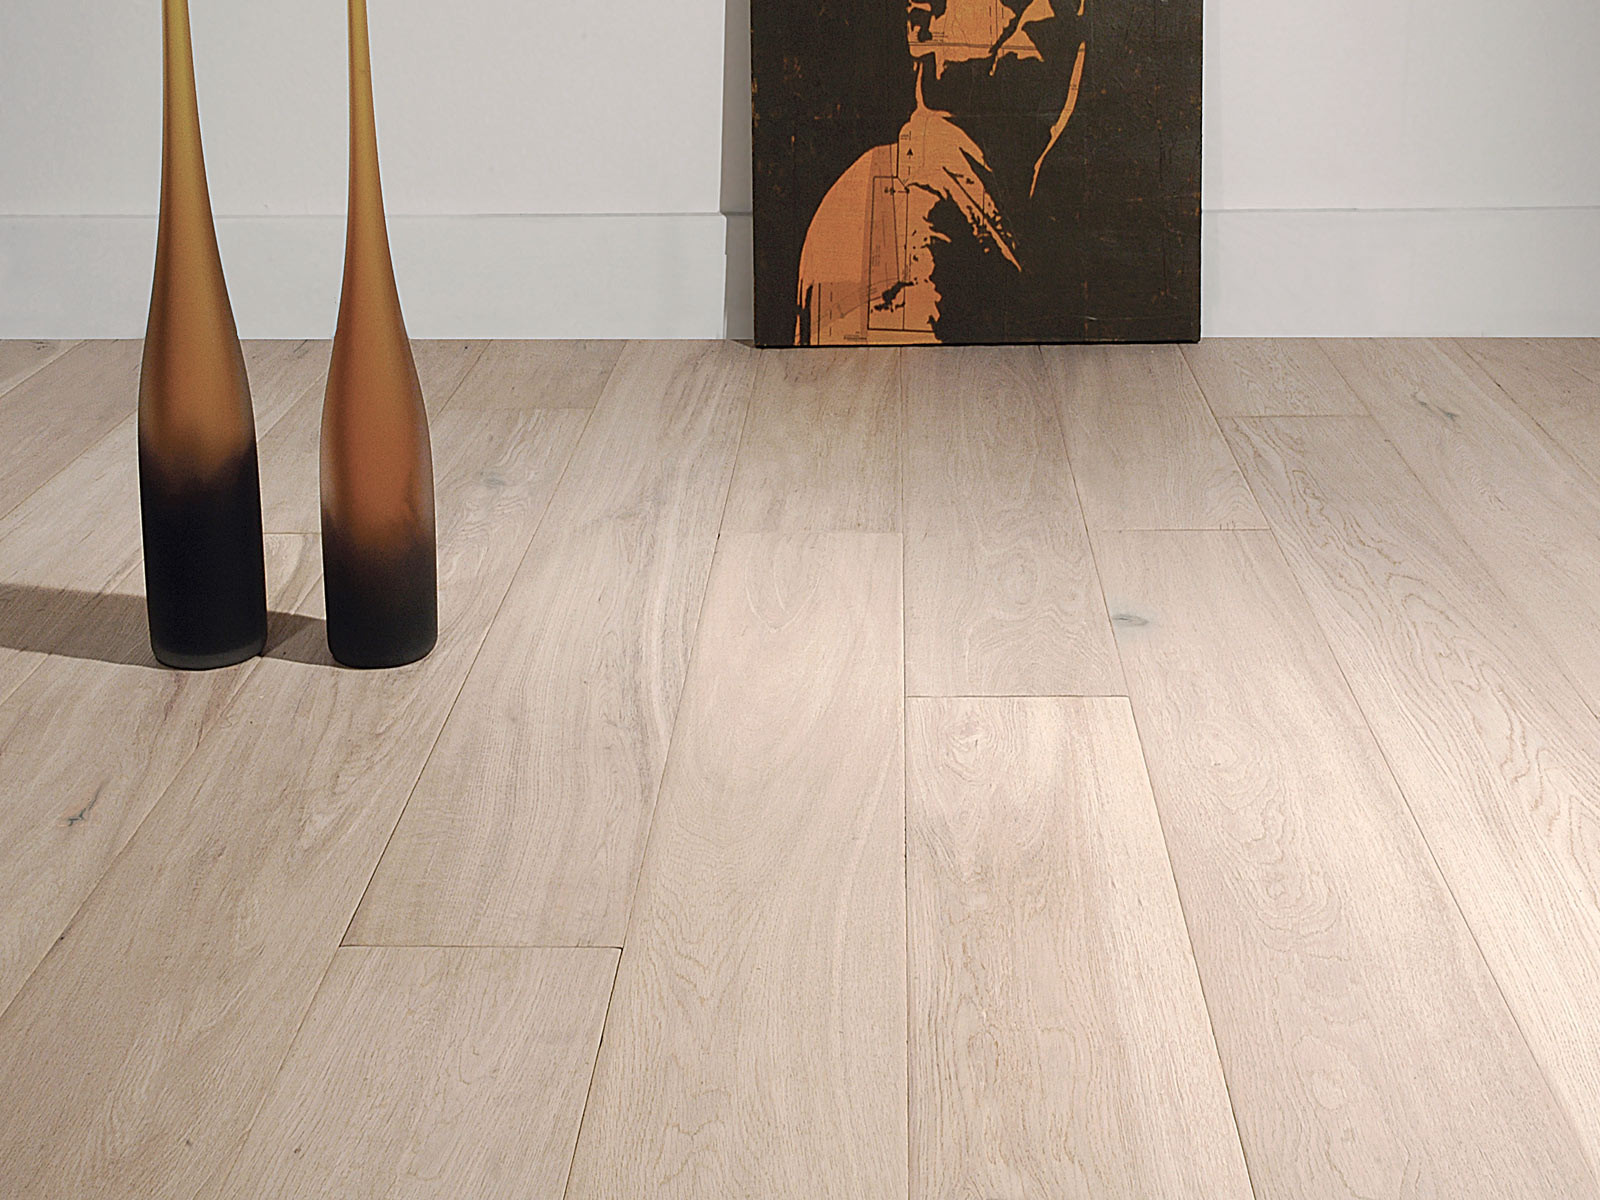 walnut hardwood flooring durability of duchateau hardwood flooring houston tx discount engineered wood within white oiled